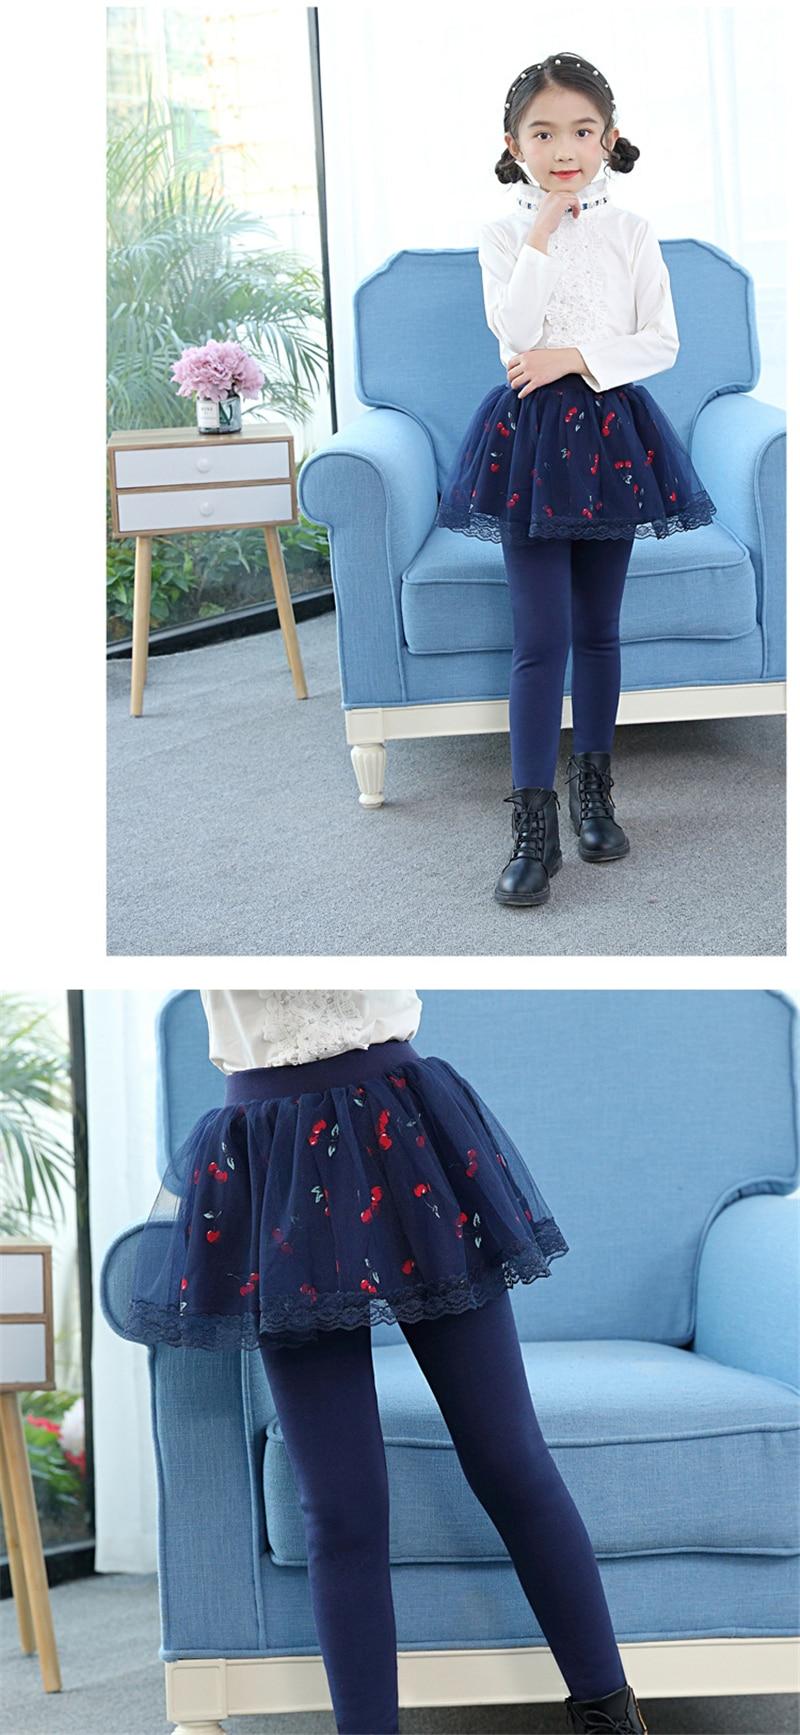 teenage girls legging with skirt07